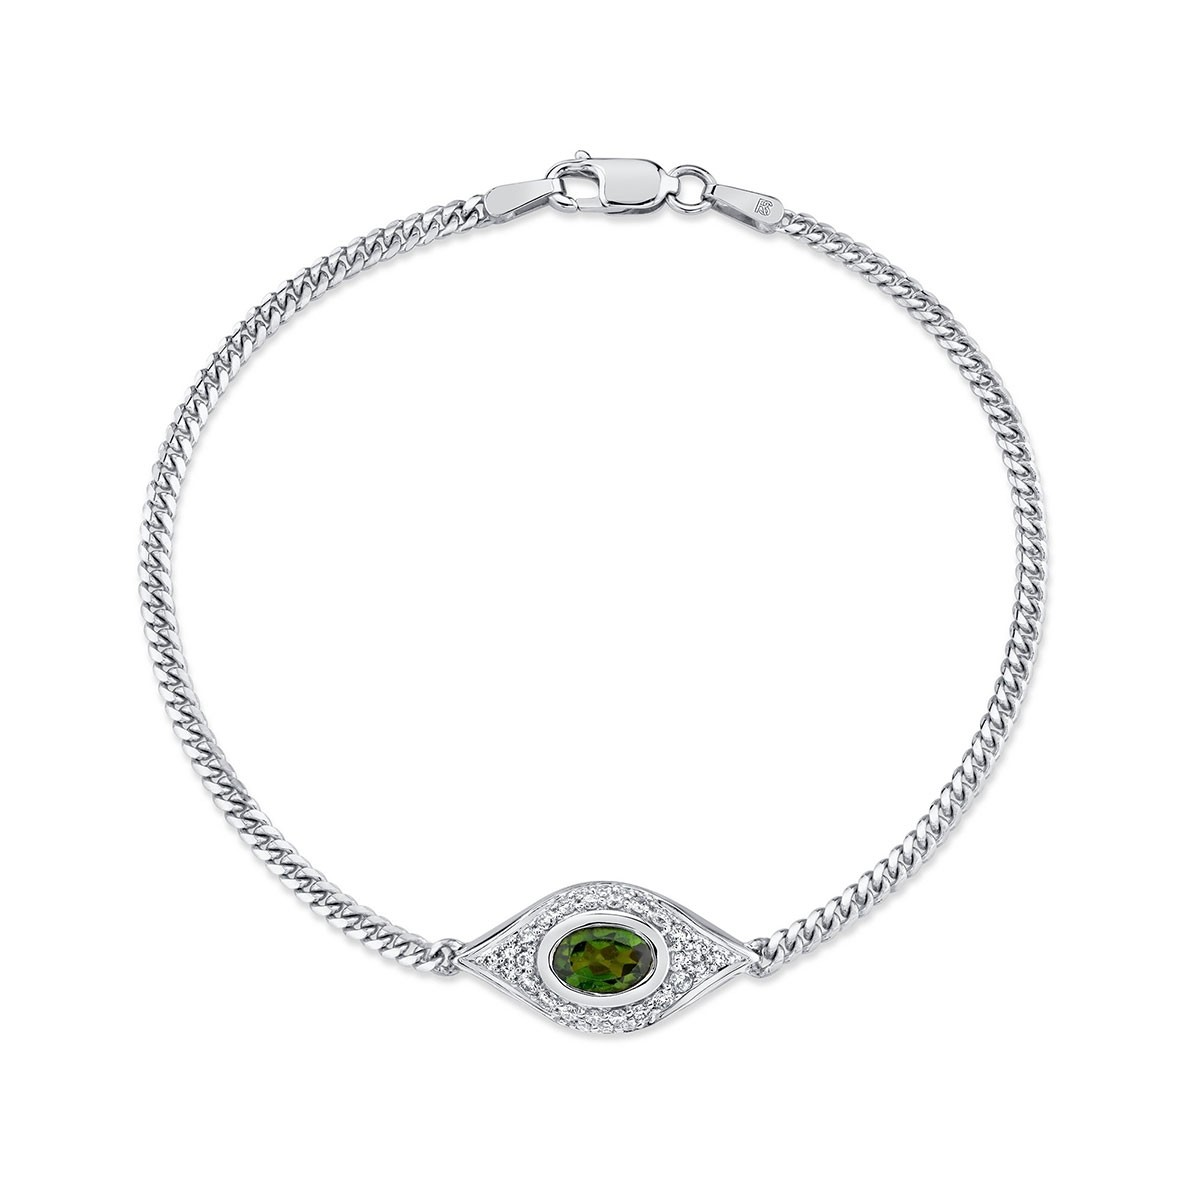 14k White Gold Diamond Oval Green Tourmaline Evil Eye Bracelet